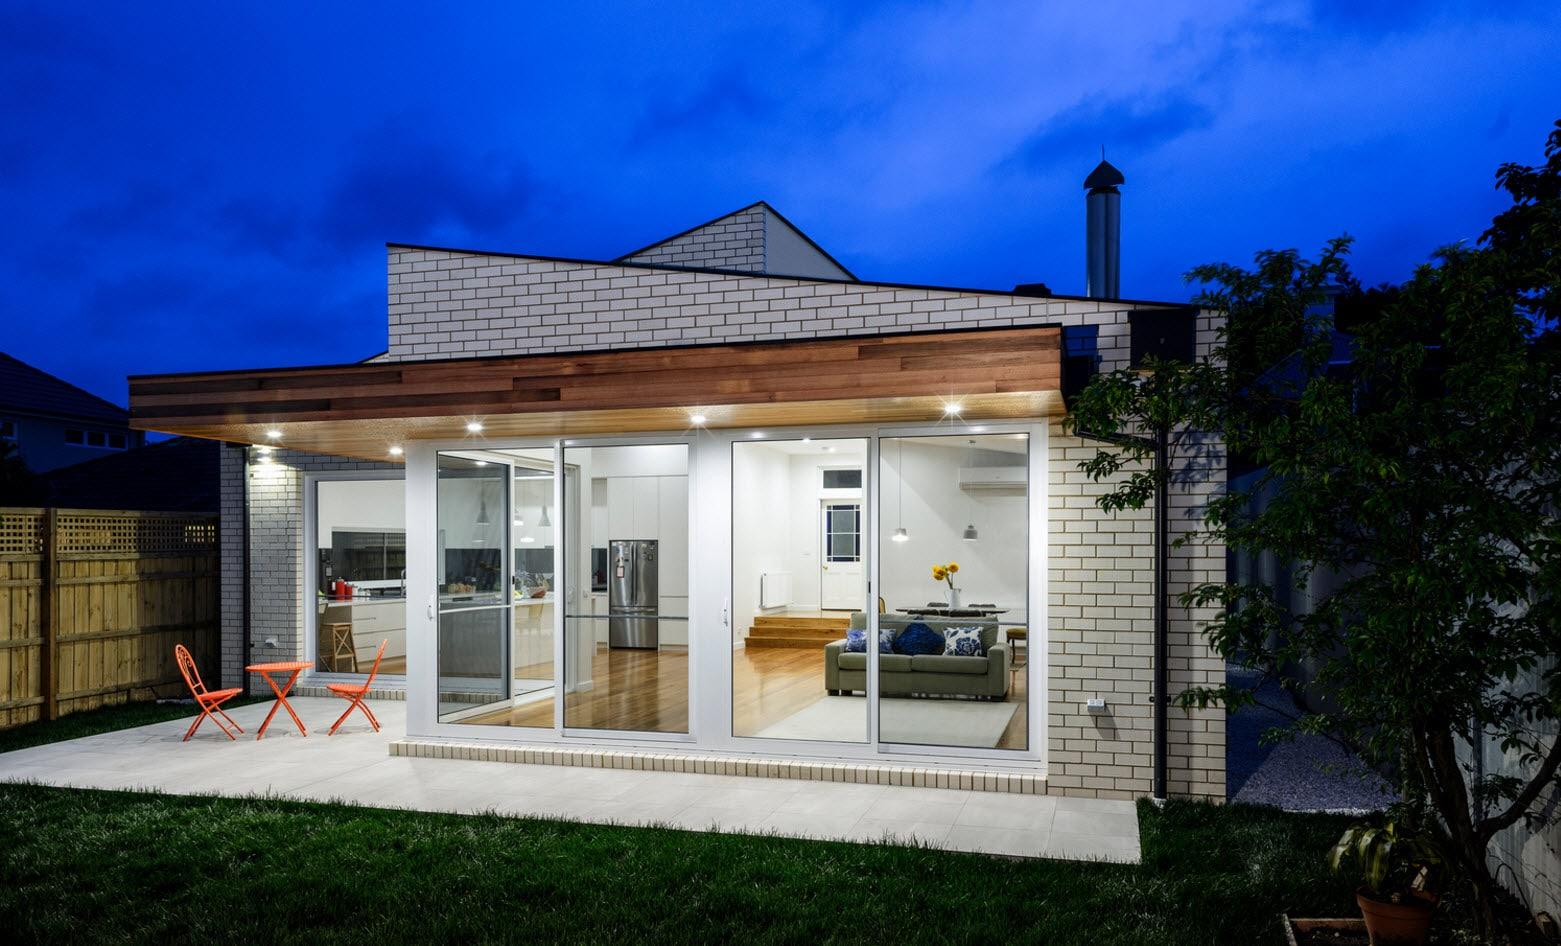 Dise o de casa moderna de un piso planos y fachadas - Fotos de casas en forma de l ...